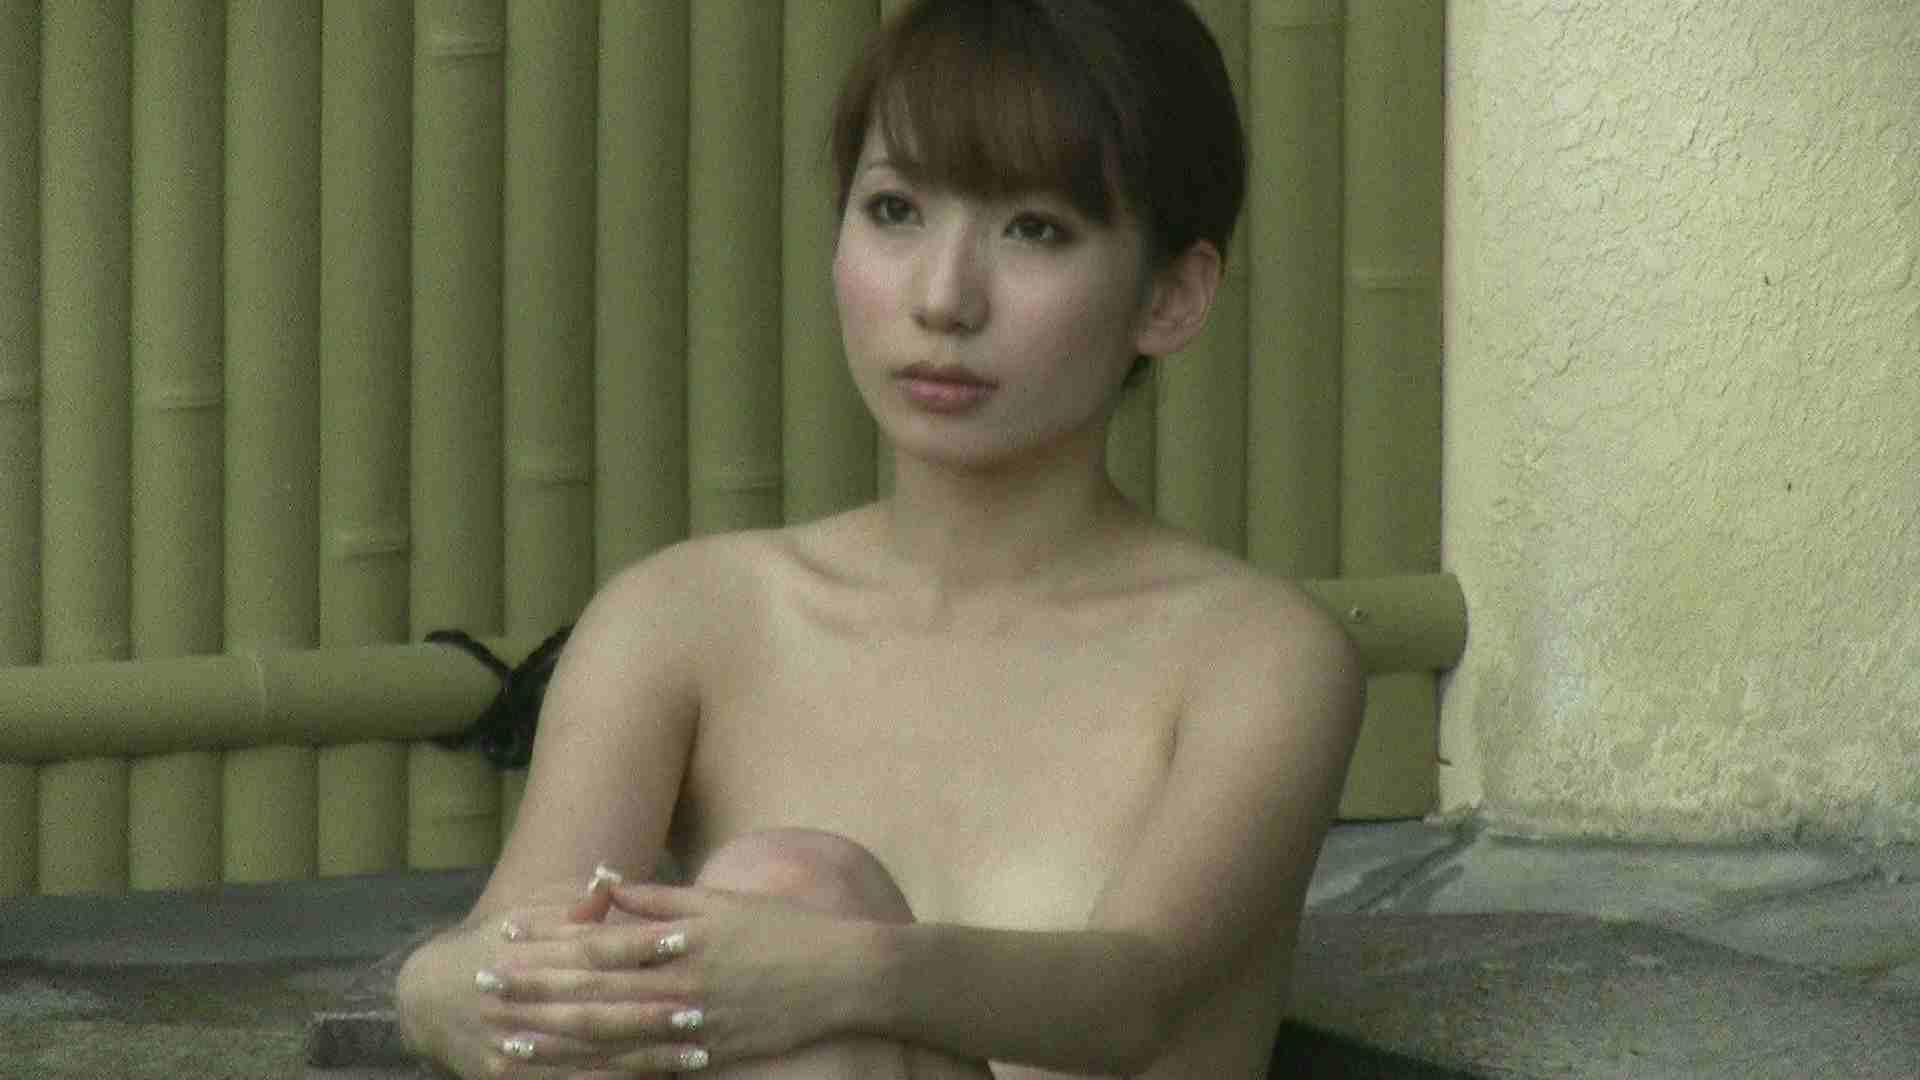 Aquaな露天風呂Vol.208 HなOL   盗撮  101pic 89